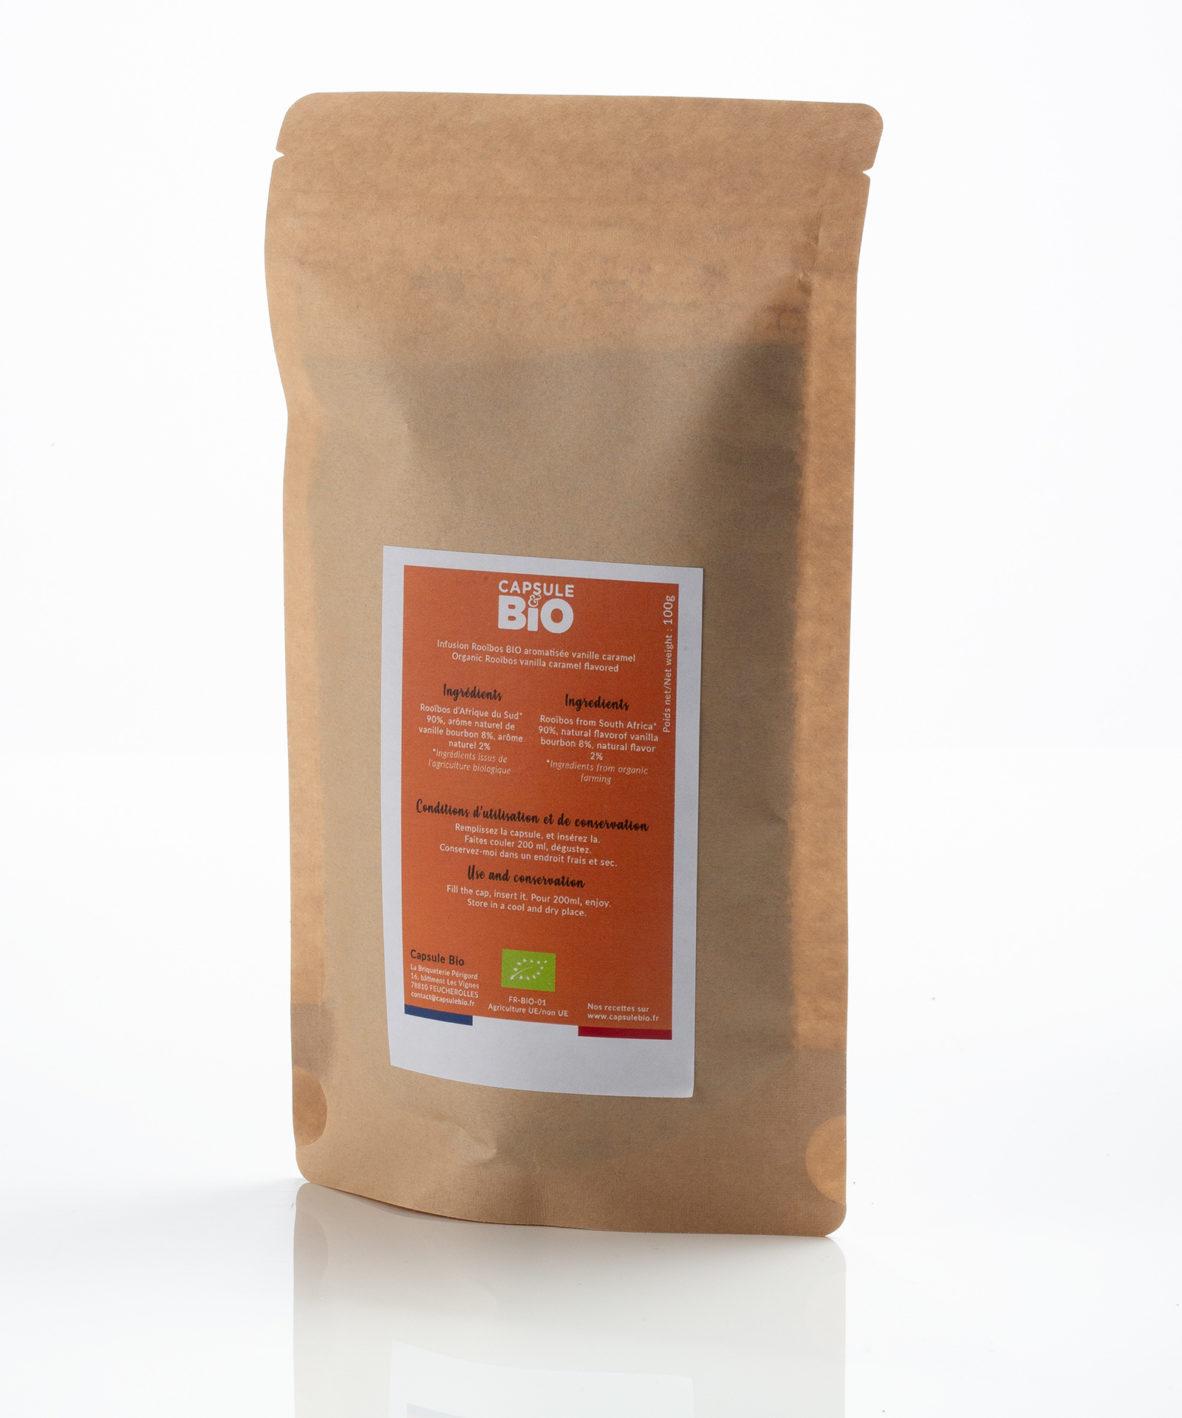 Capsulebio sachet infusion en vrac recette rooibos bio caramel